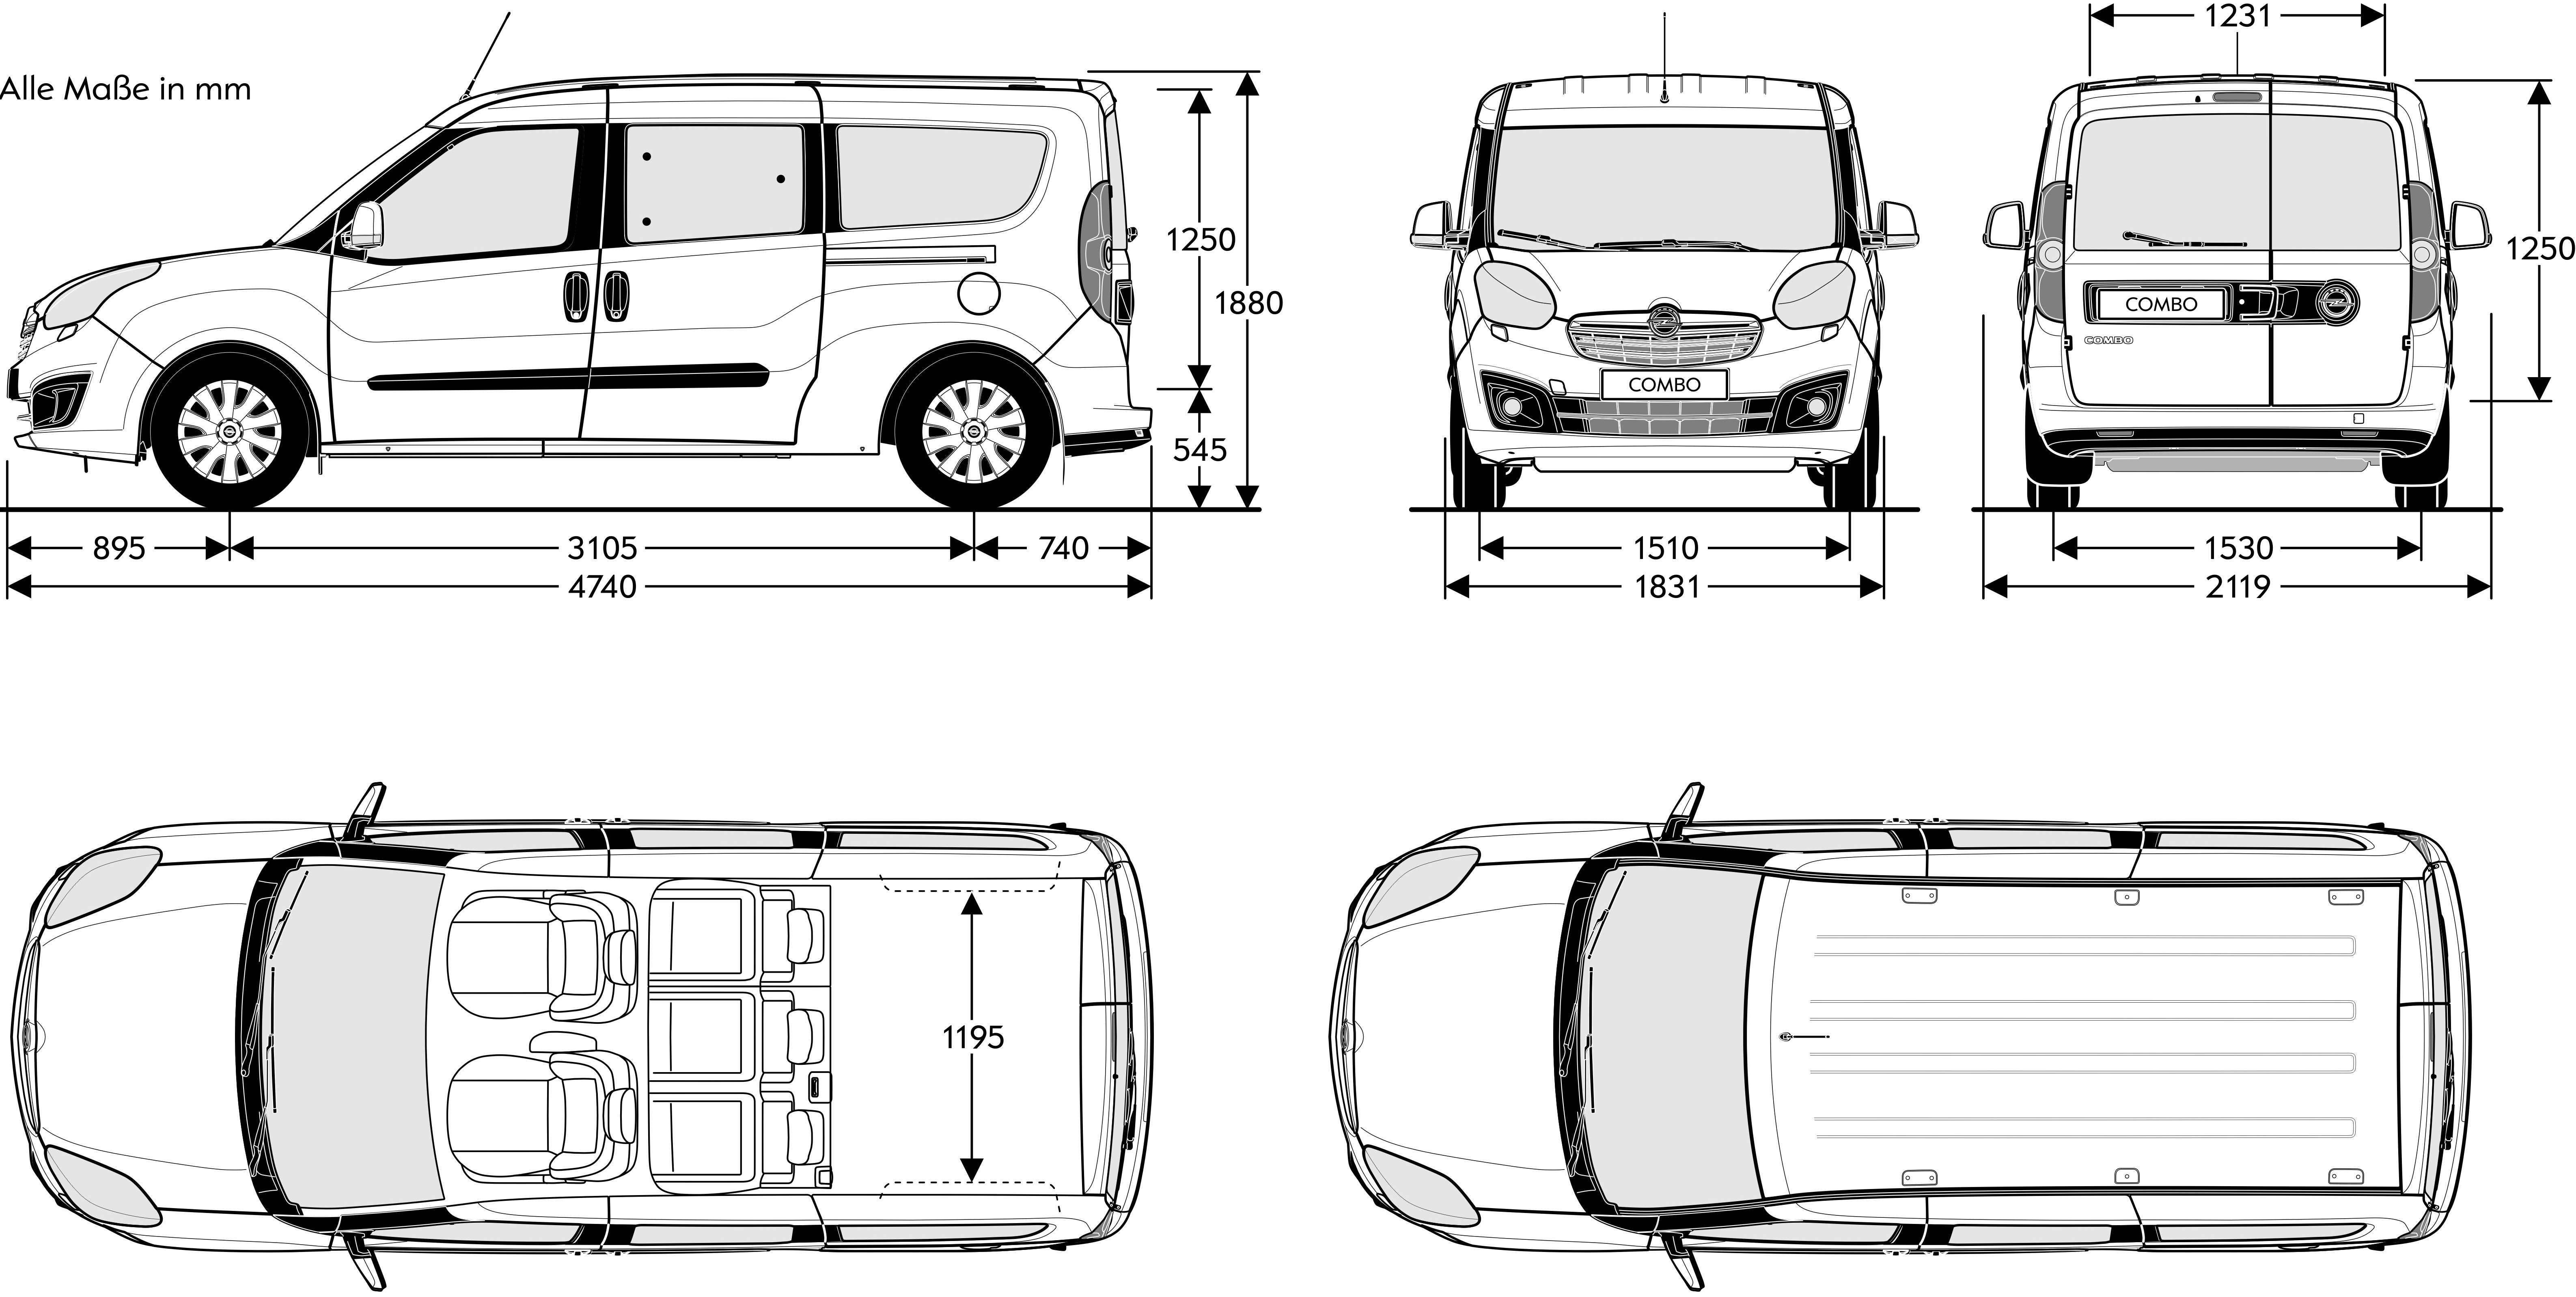 Fiat Doblo Van Dimension